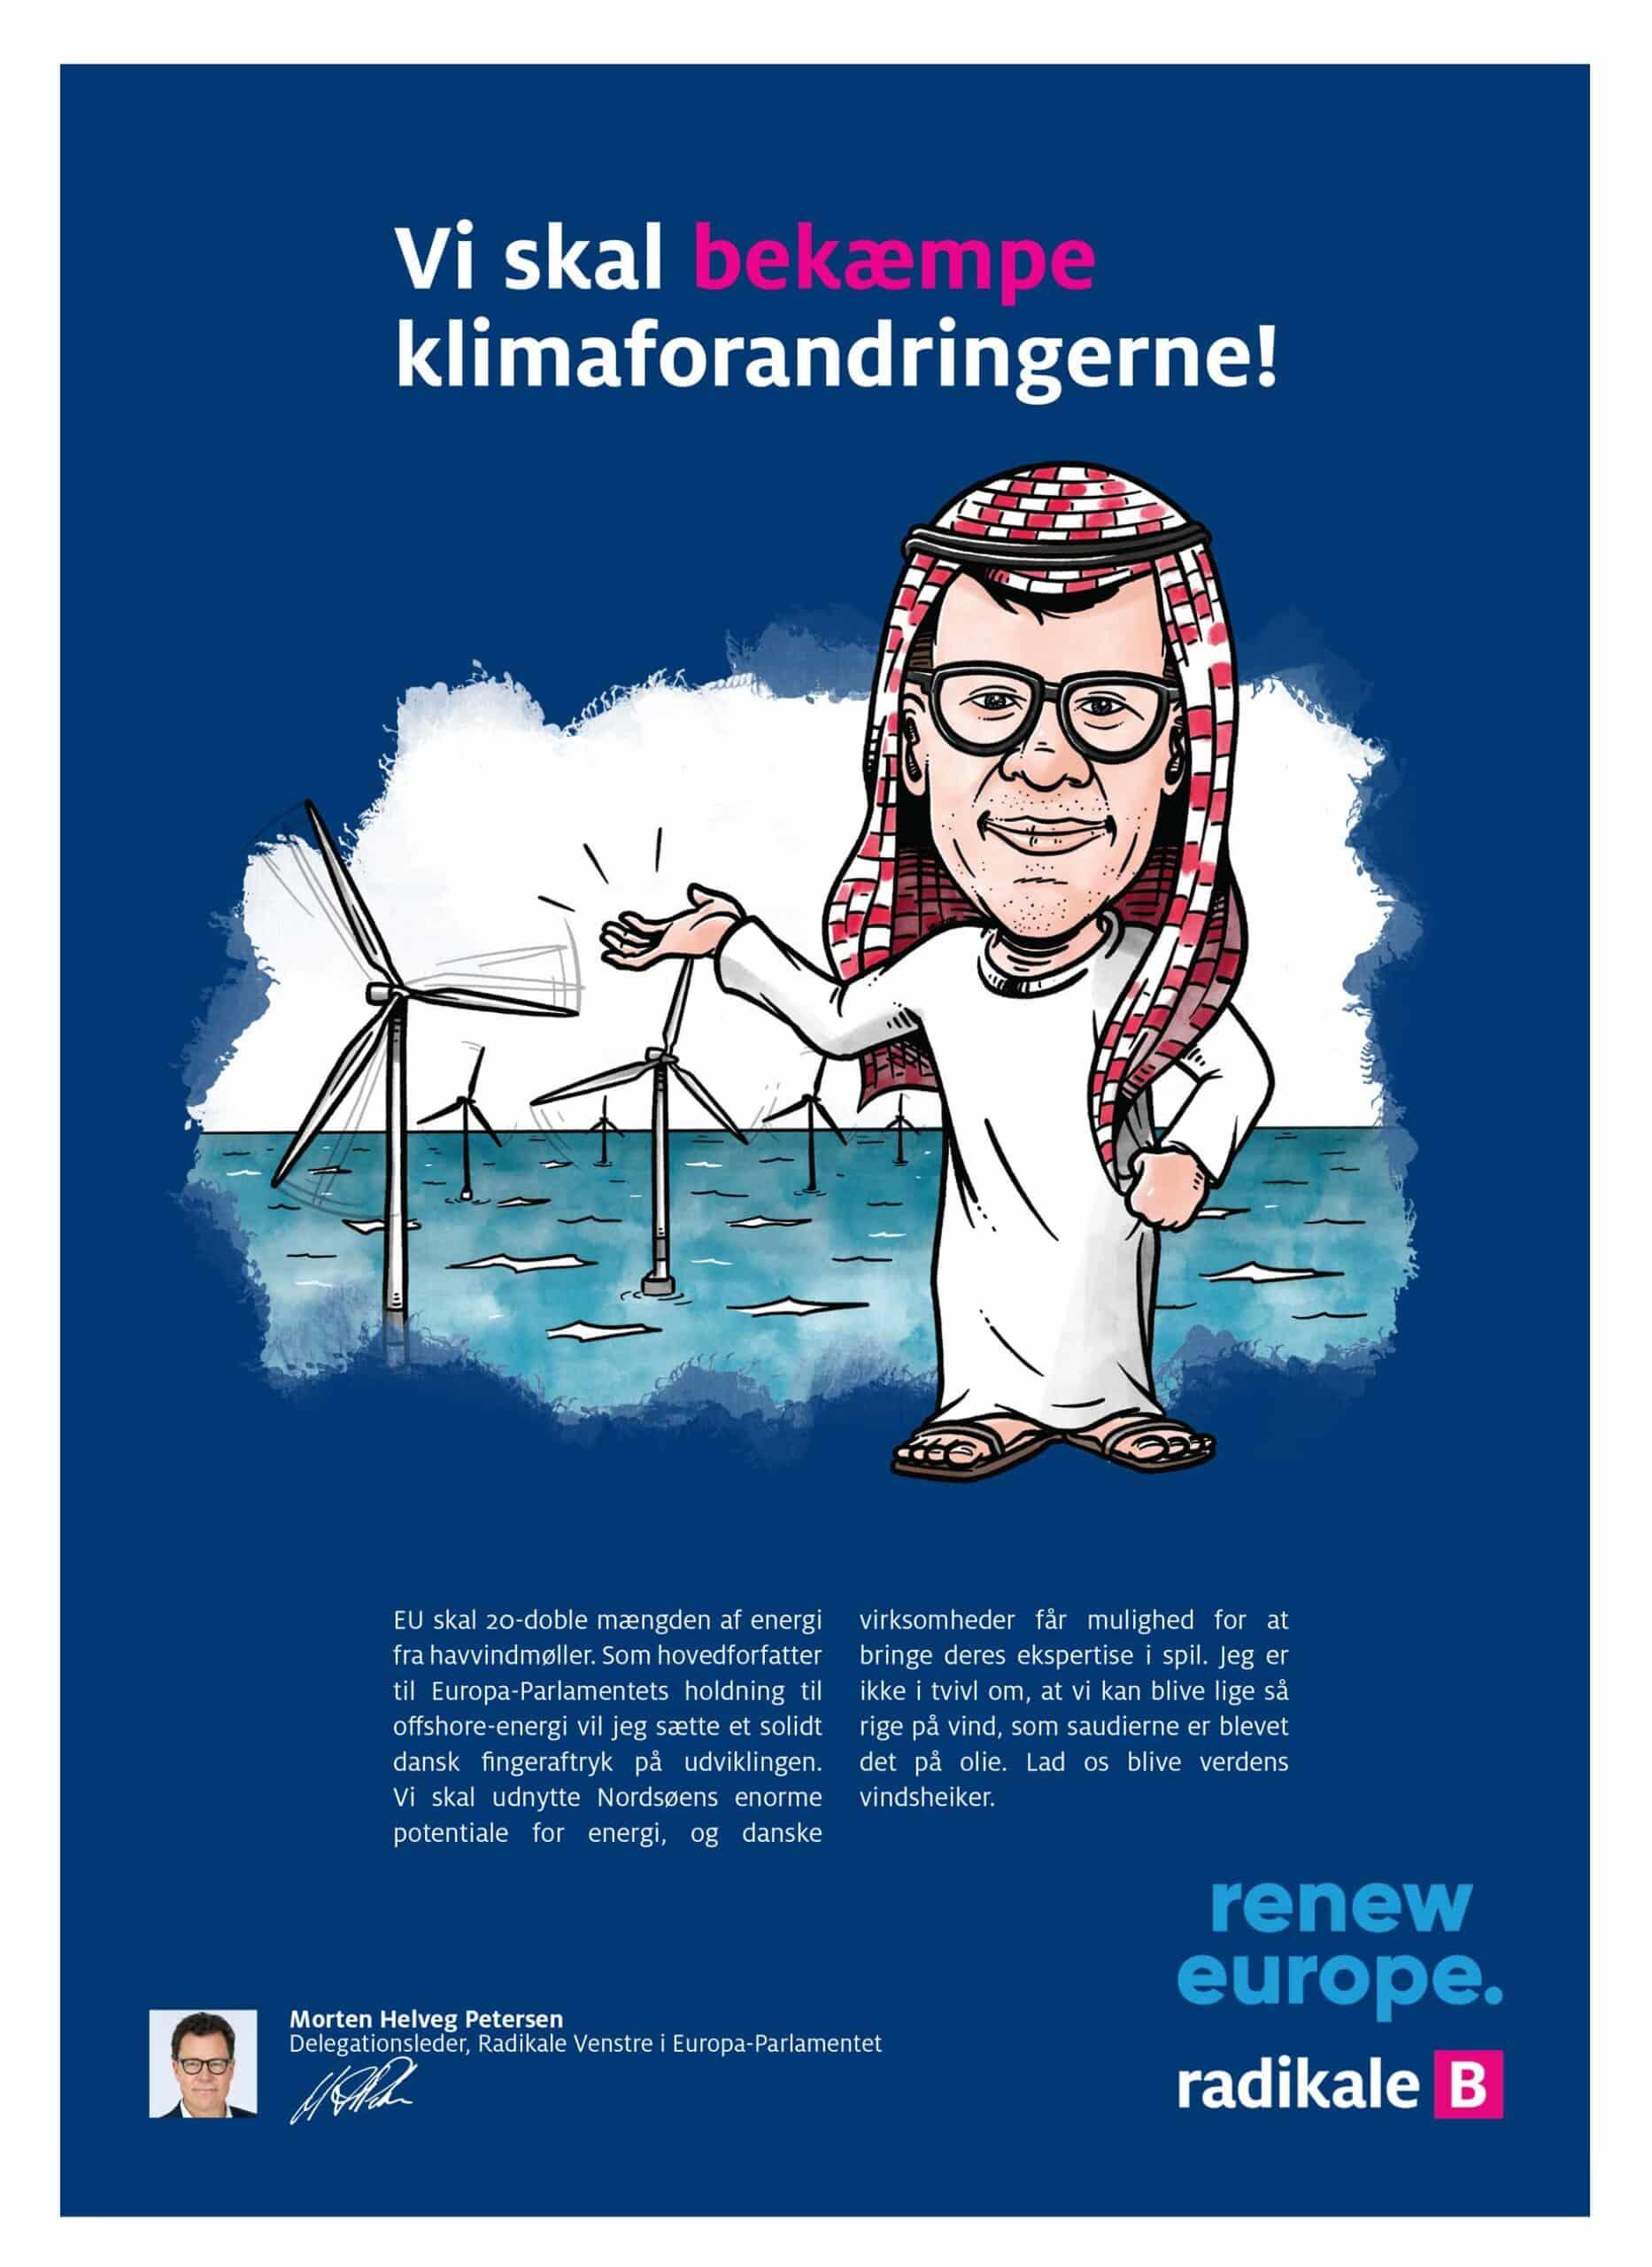 Artikelillustrationer for Radikale Venstre: Vi skal bekæmpe klimaforandringerne!